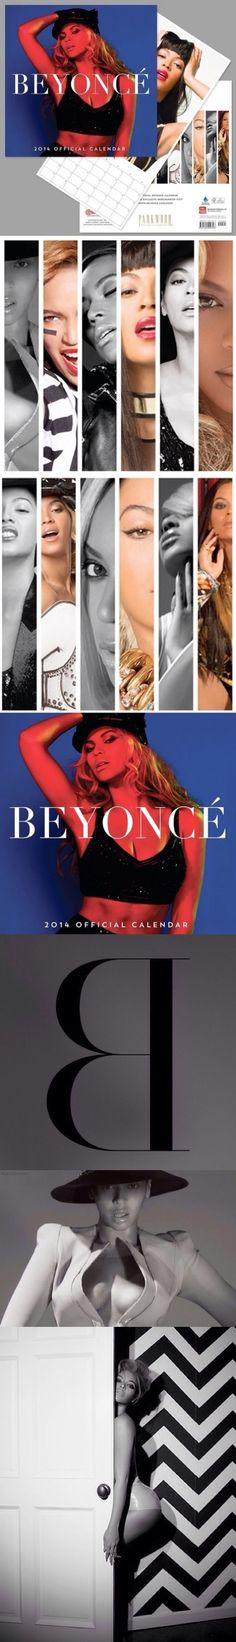 2014 Beyonce Calendar